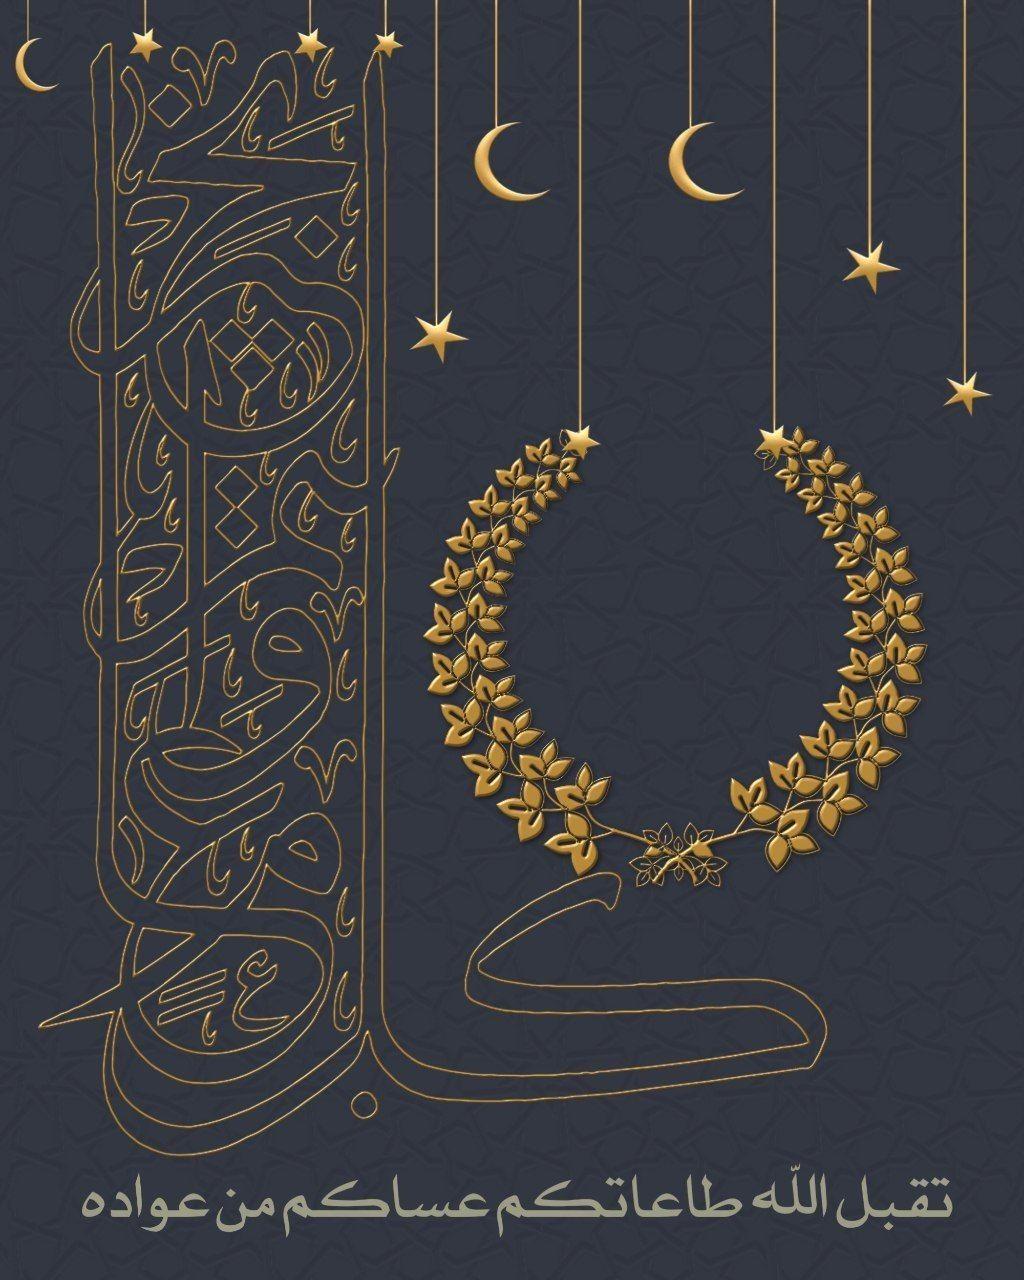 Pin By Sarah On العيد الفطر المبارك والاضحي Islamic Paintings Graphic Design Design